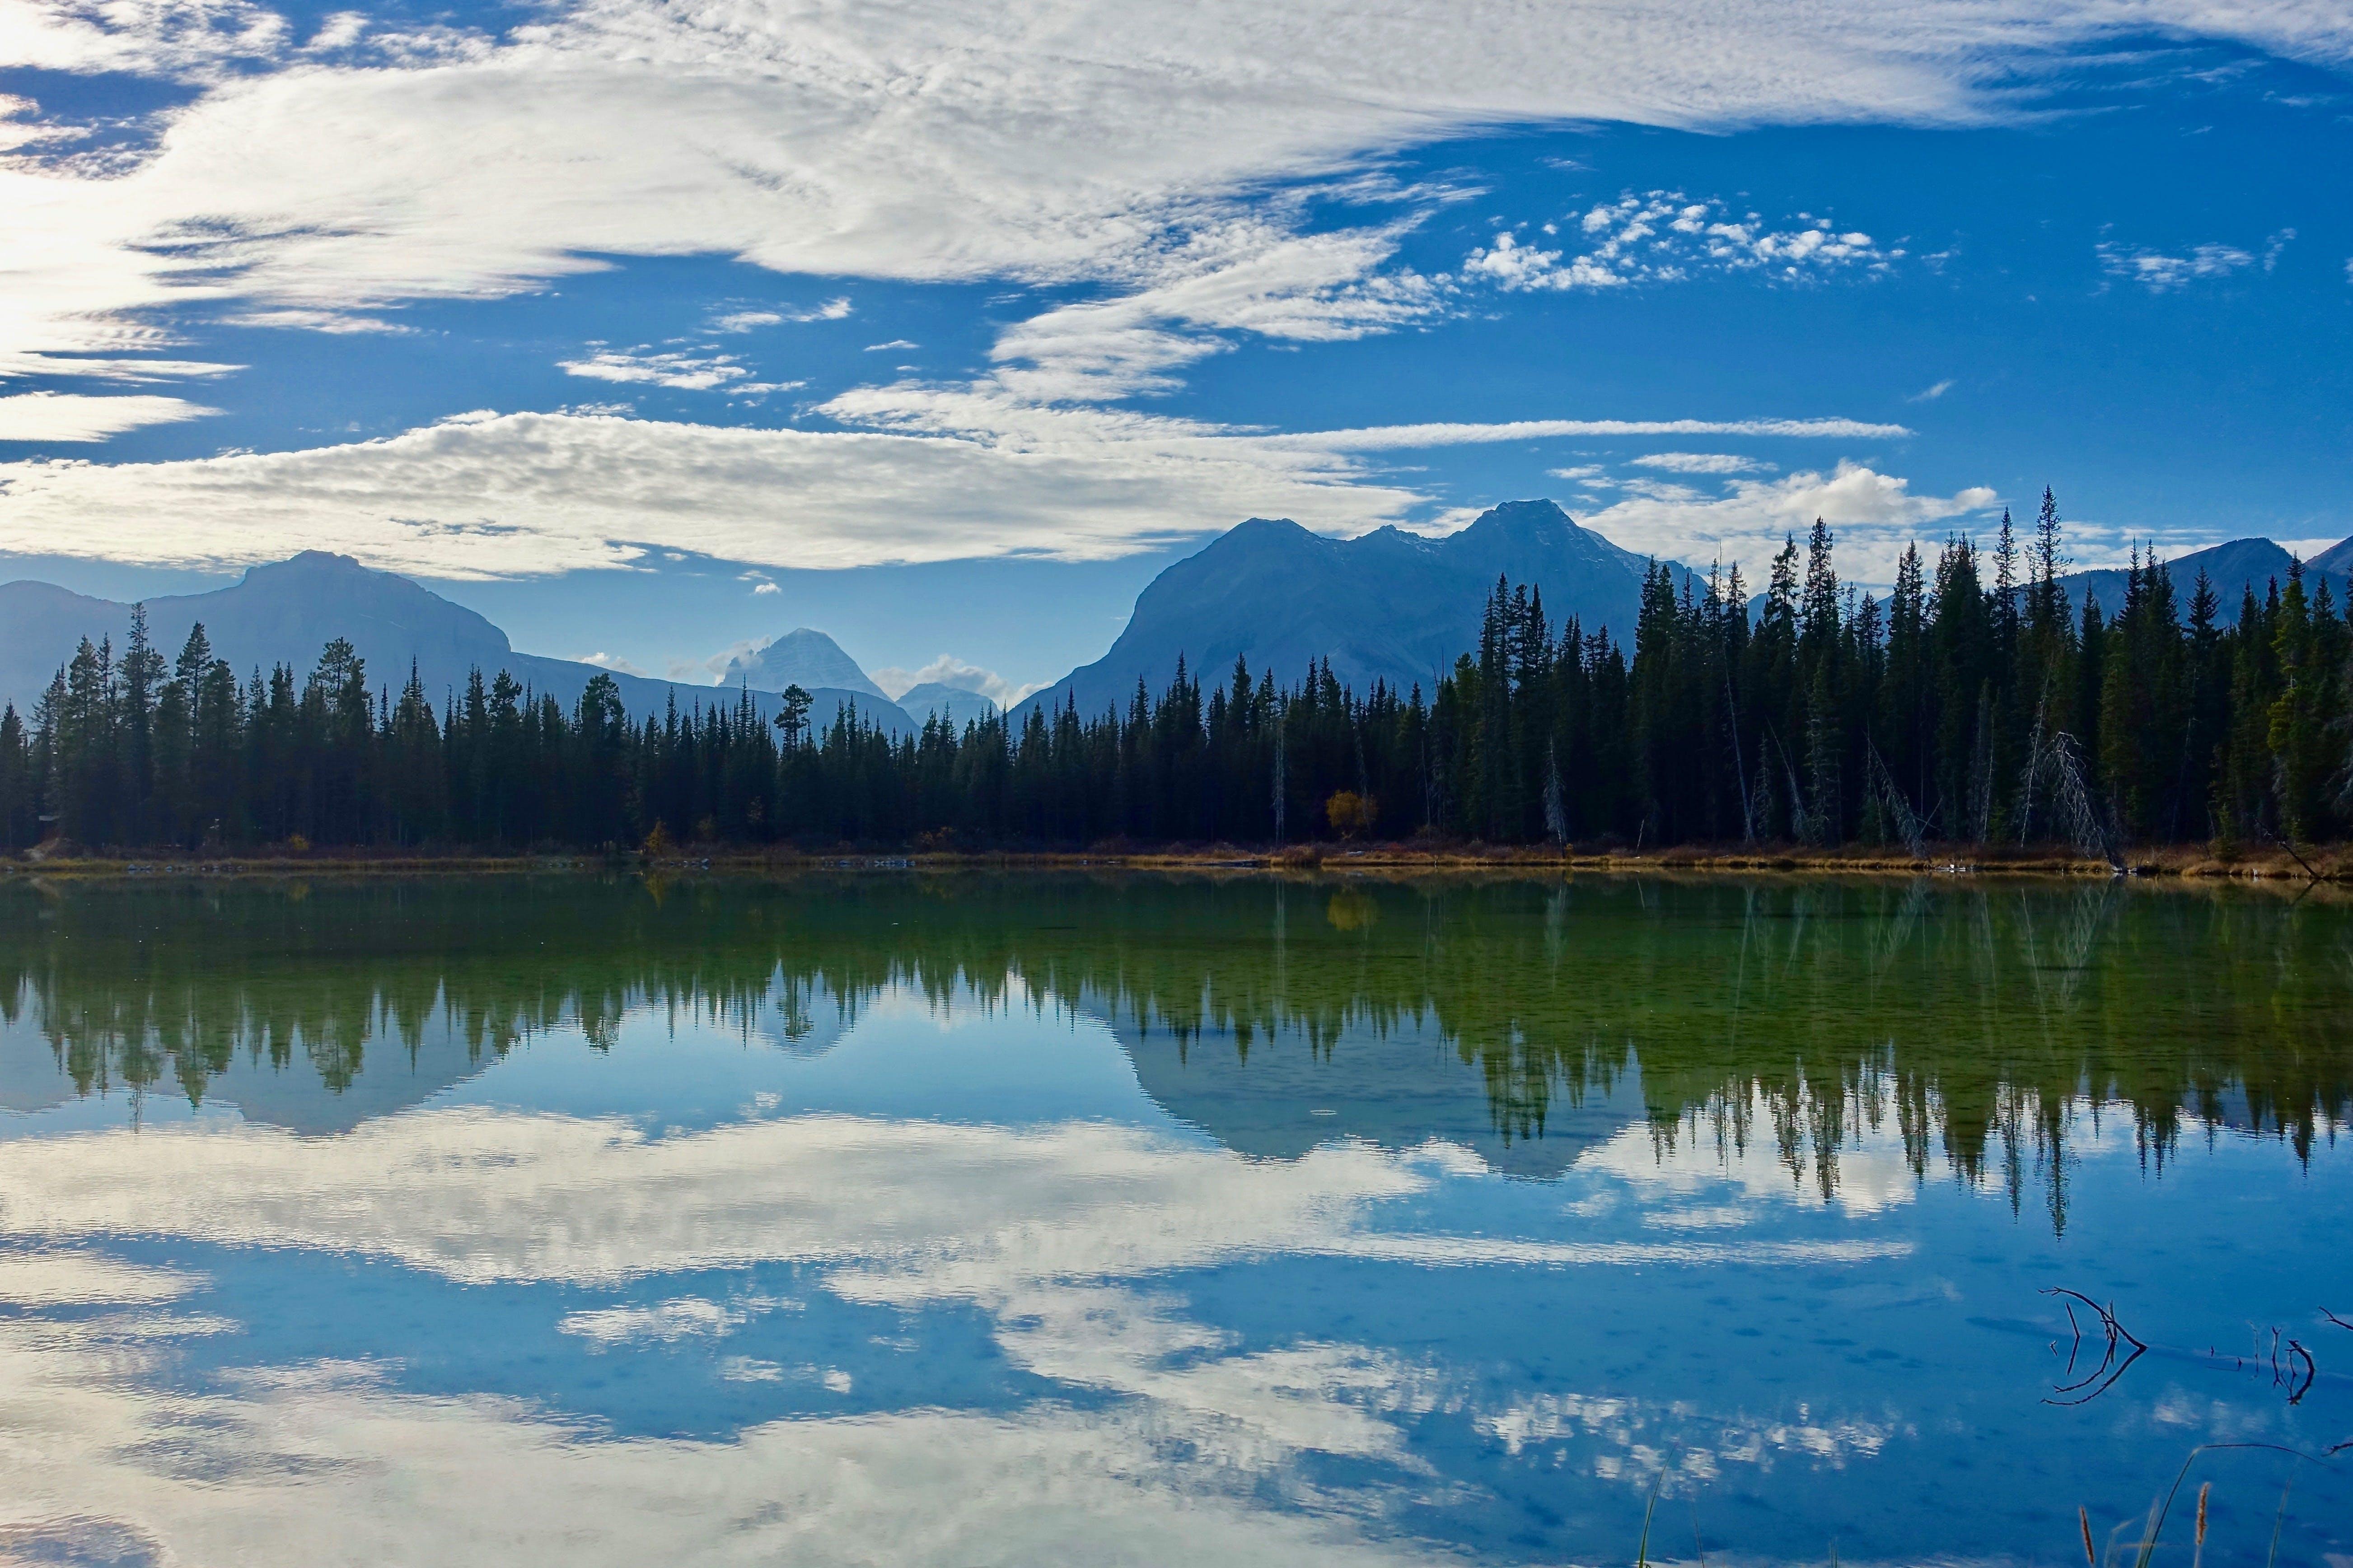 lake, landscape, mountain